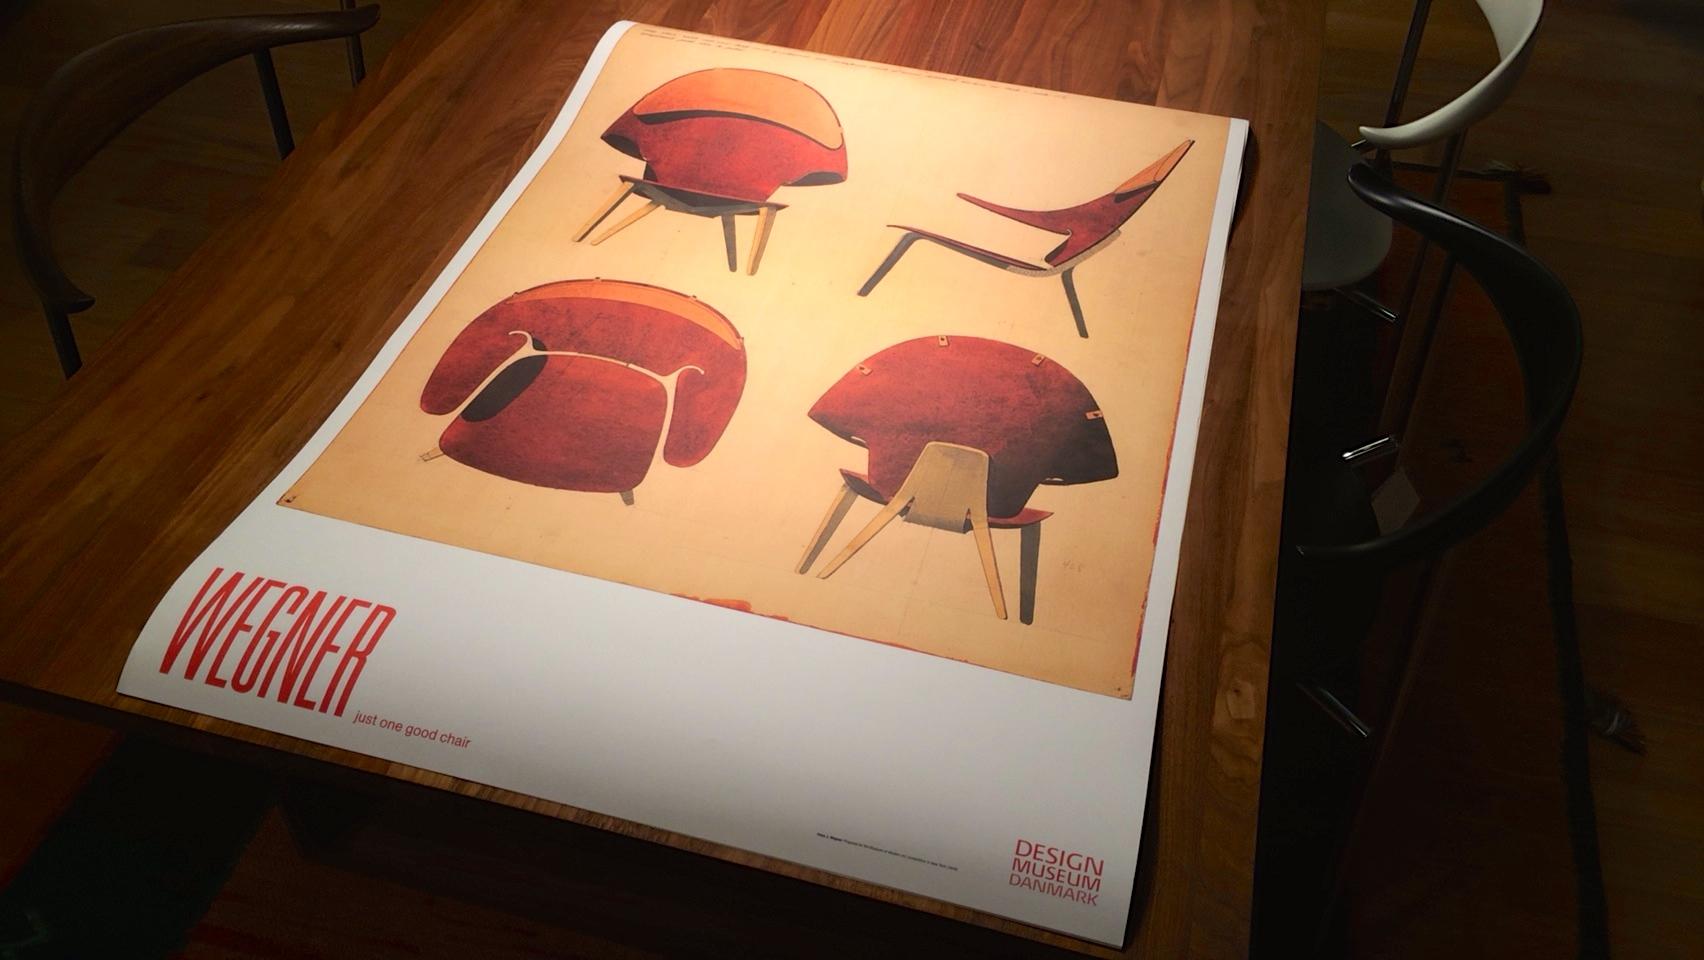 http://www.sora-design.com/images/bl-2980.jpg